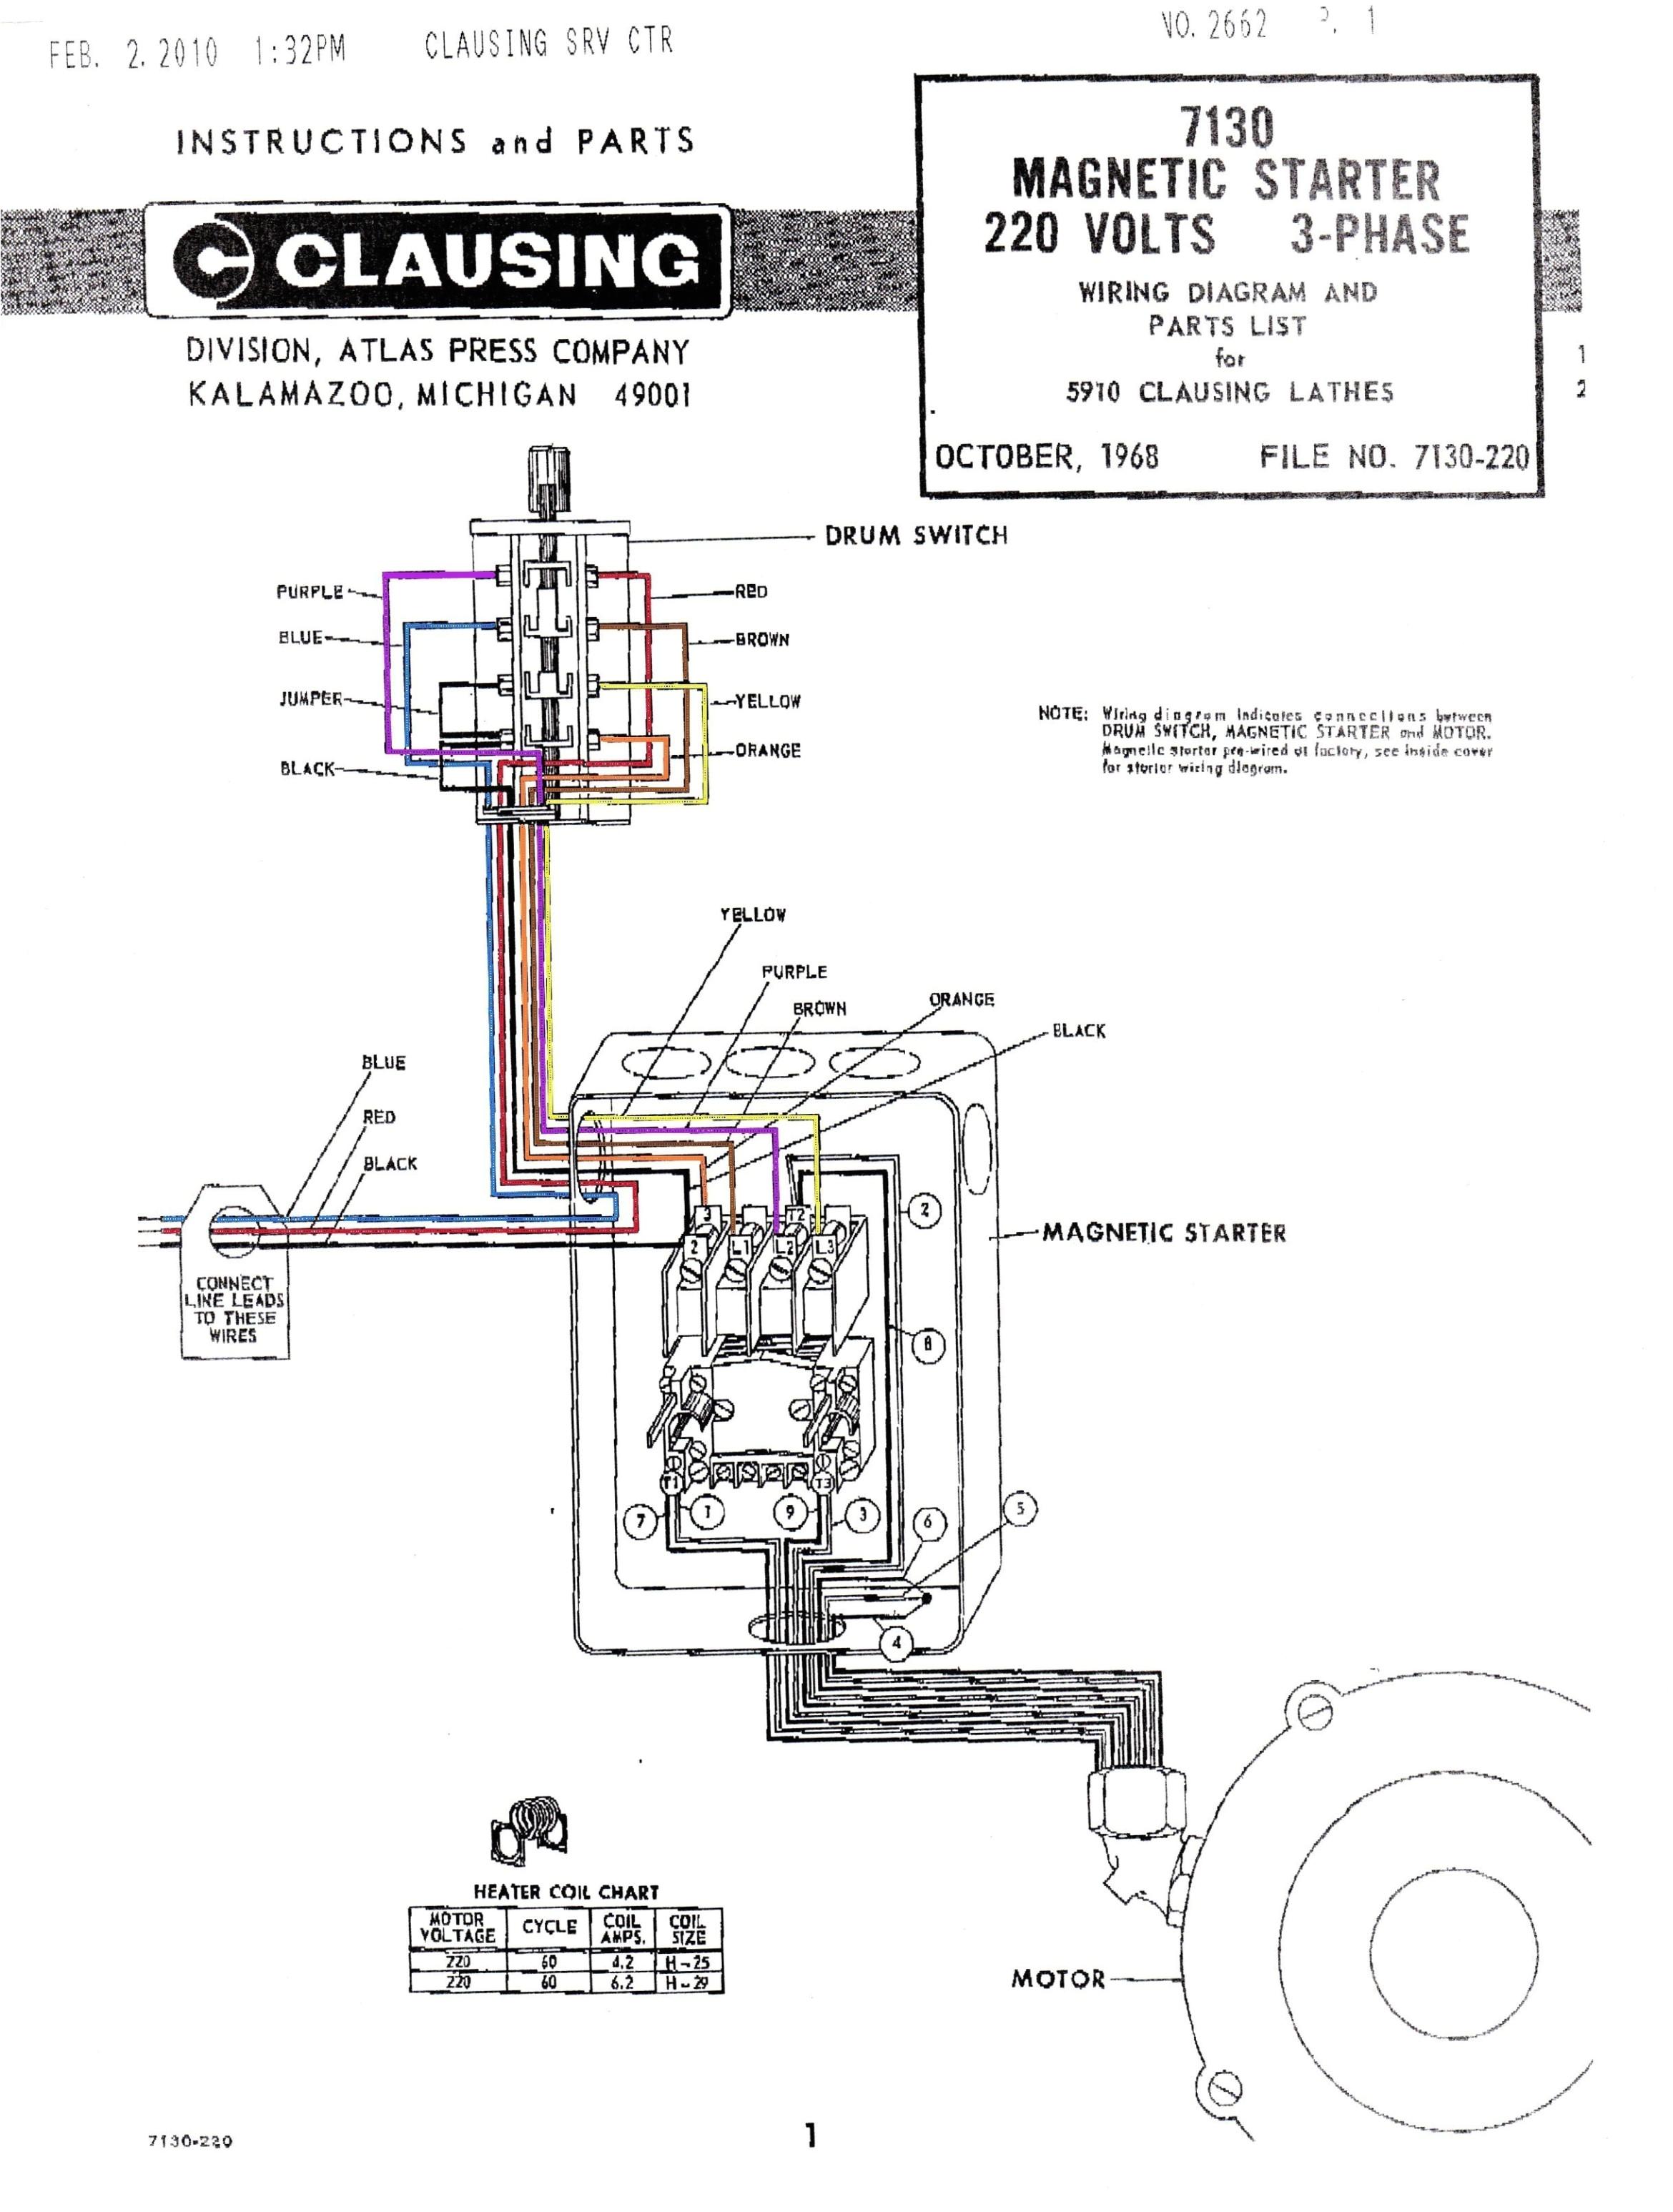 Cutler Hammer Starter Wiring Diagram Cutler Hammer Contactor Wiring Diagram Wiring Diagram